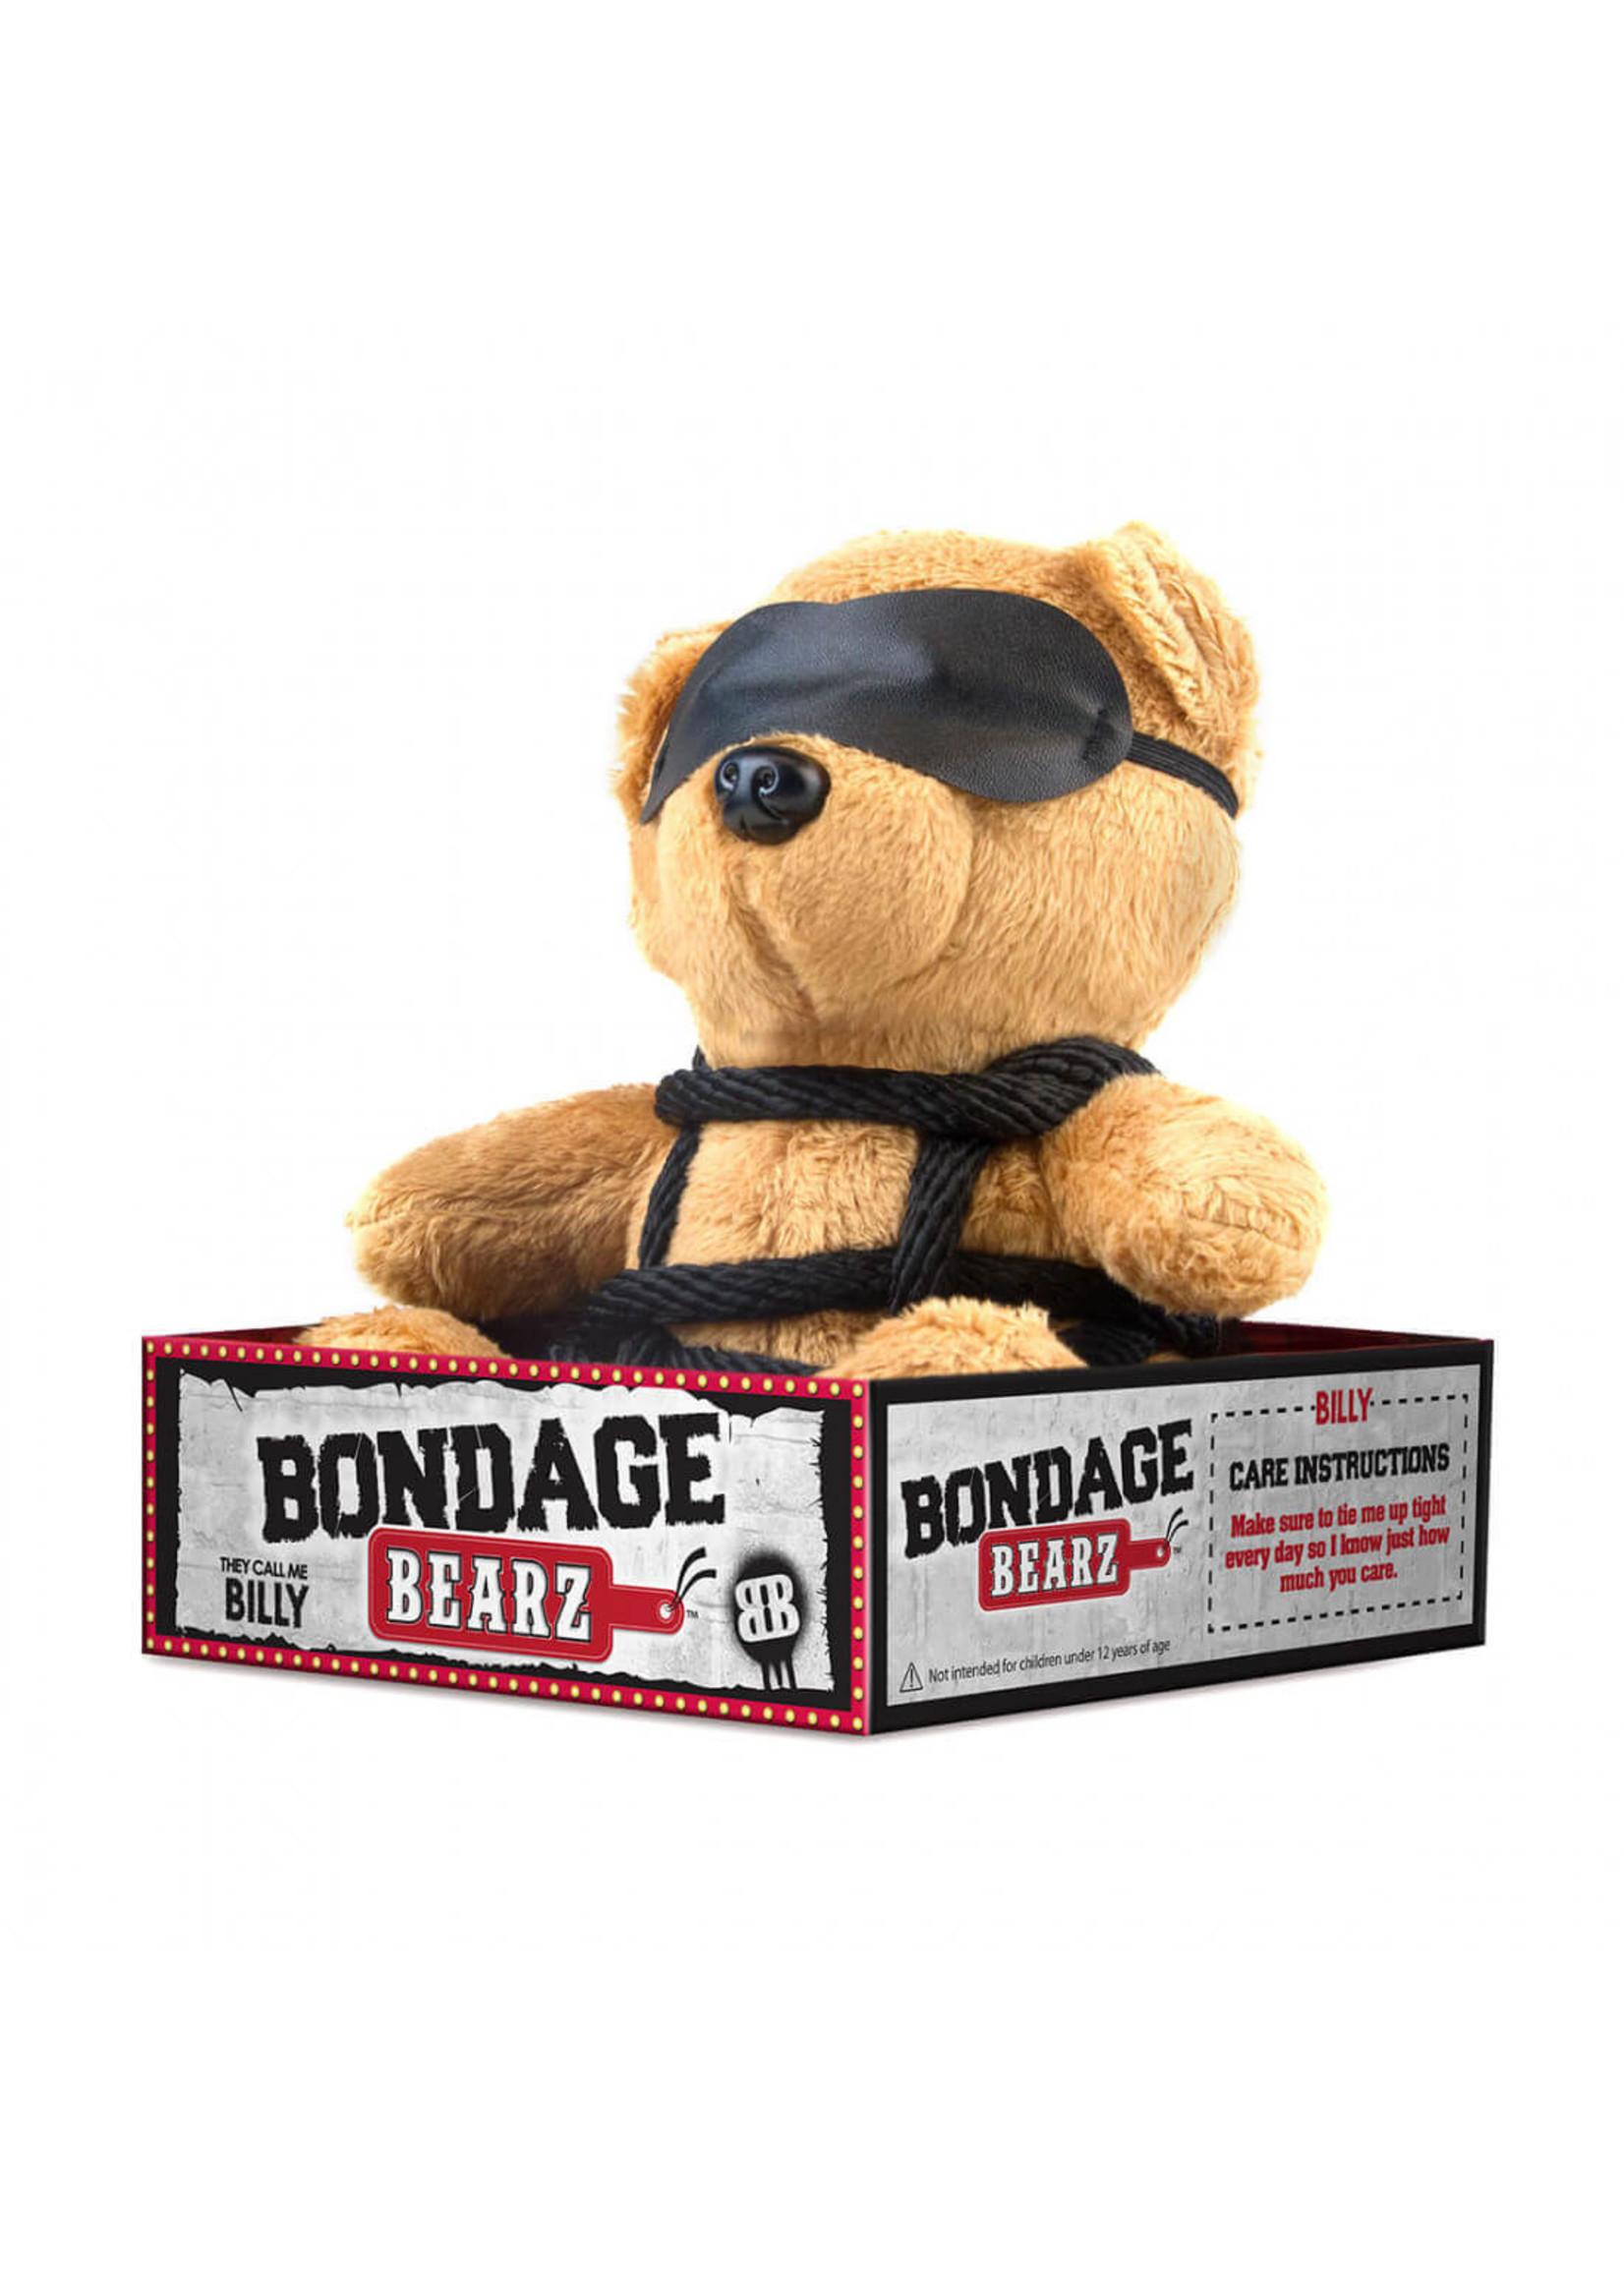 Bondage Bearz - Bound Up Bill Bear